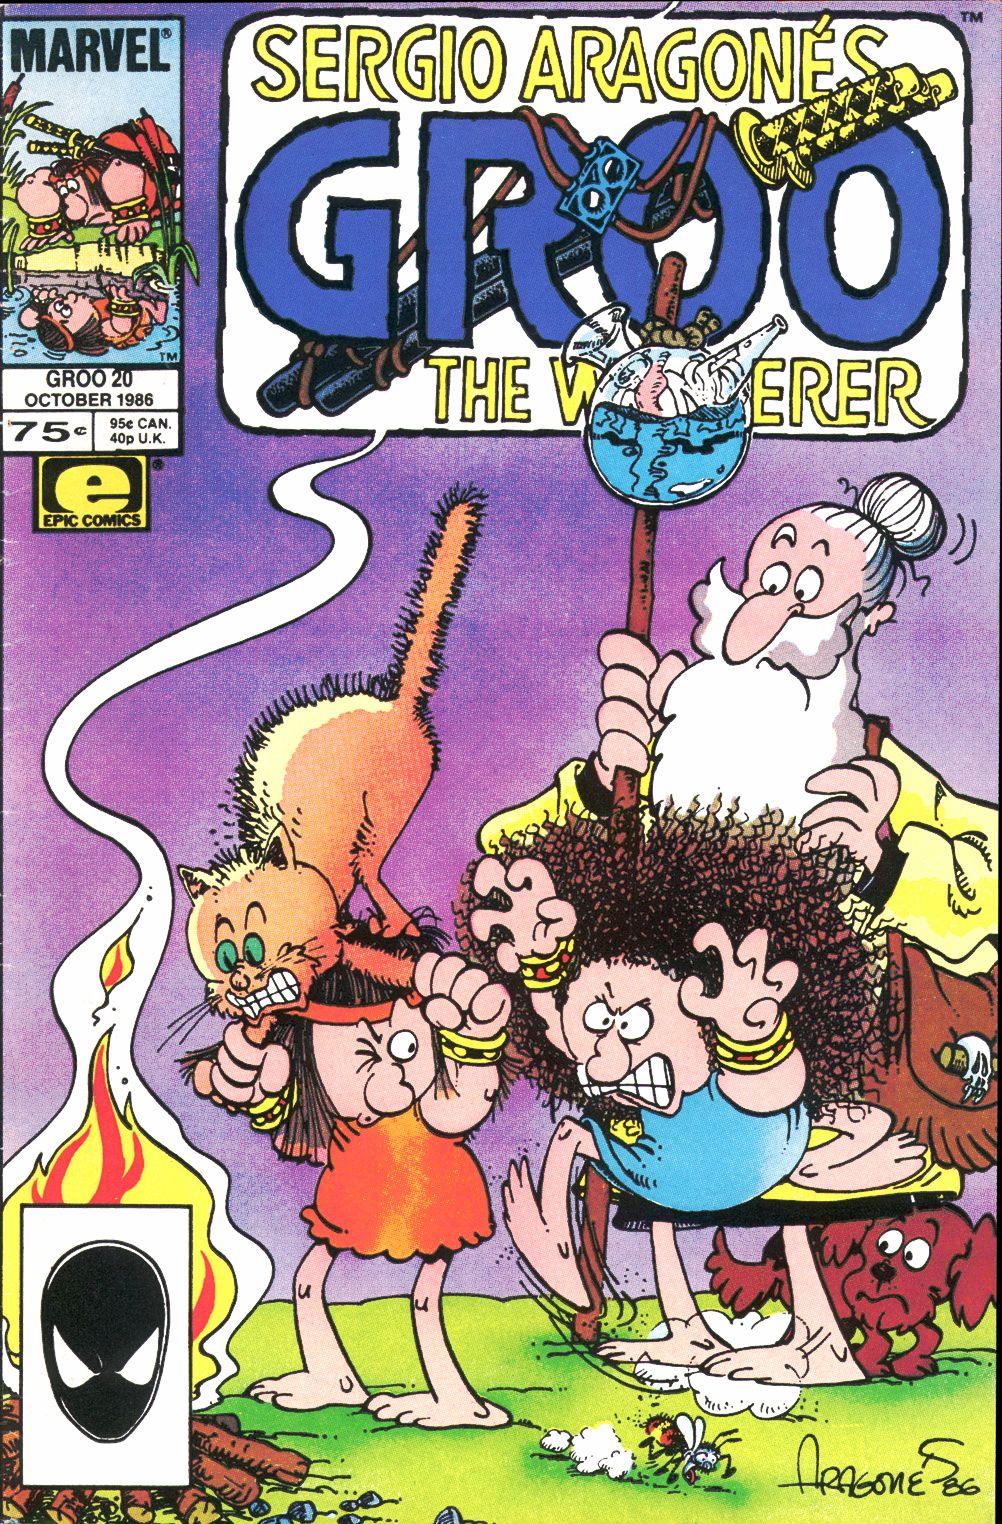 Read online Sergio Aragonés Groo the Wanderer comic -  Issue #20 - 1